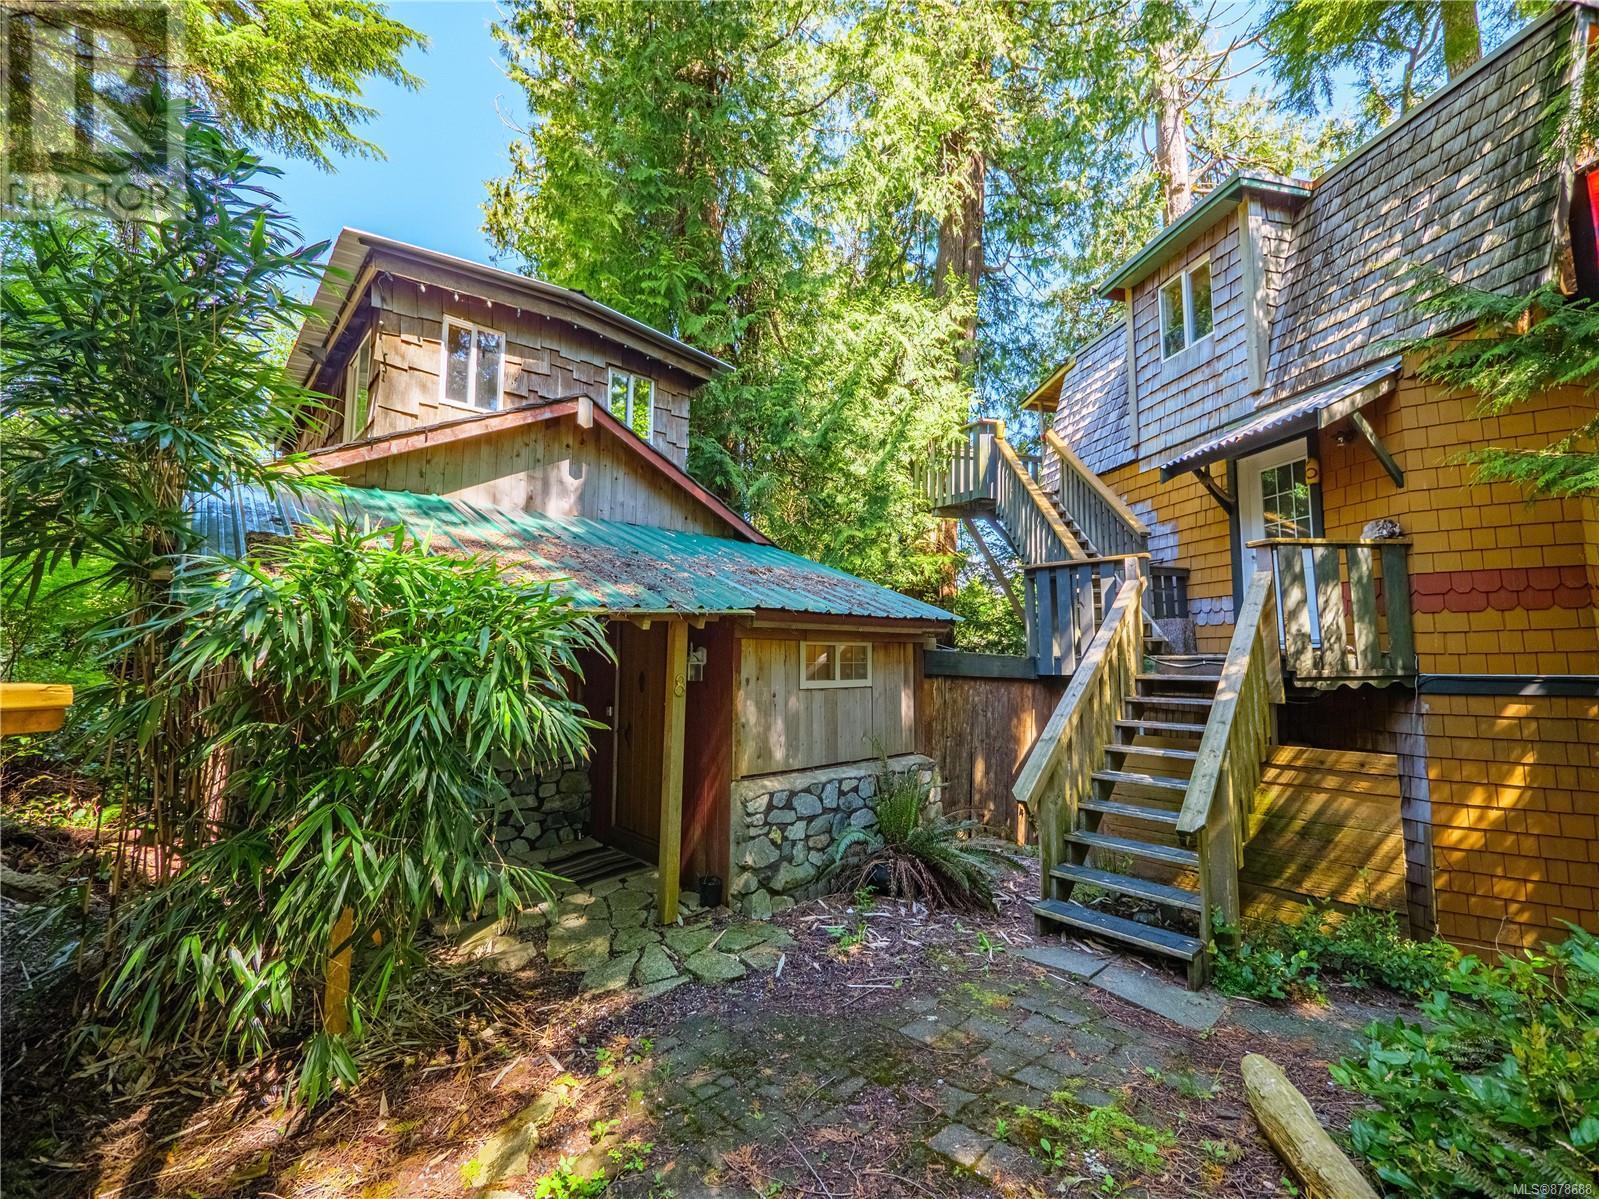 5,6,7,8 2088 Peninsula Rd, ucluelet, British Columbia